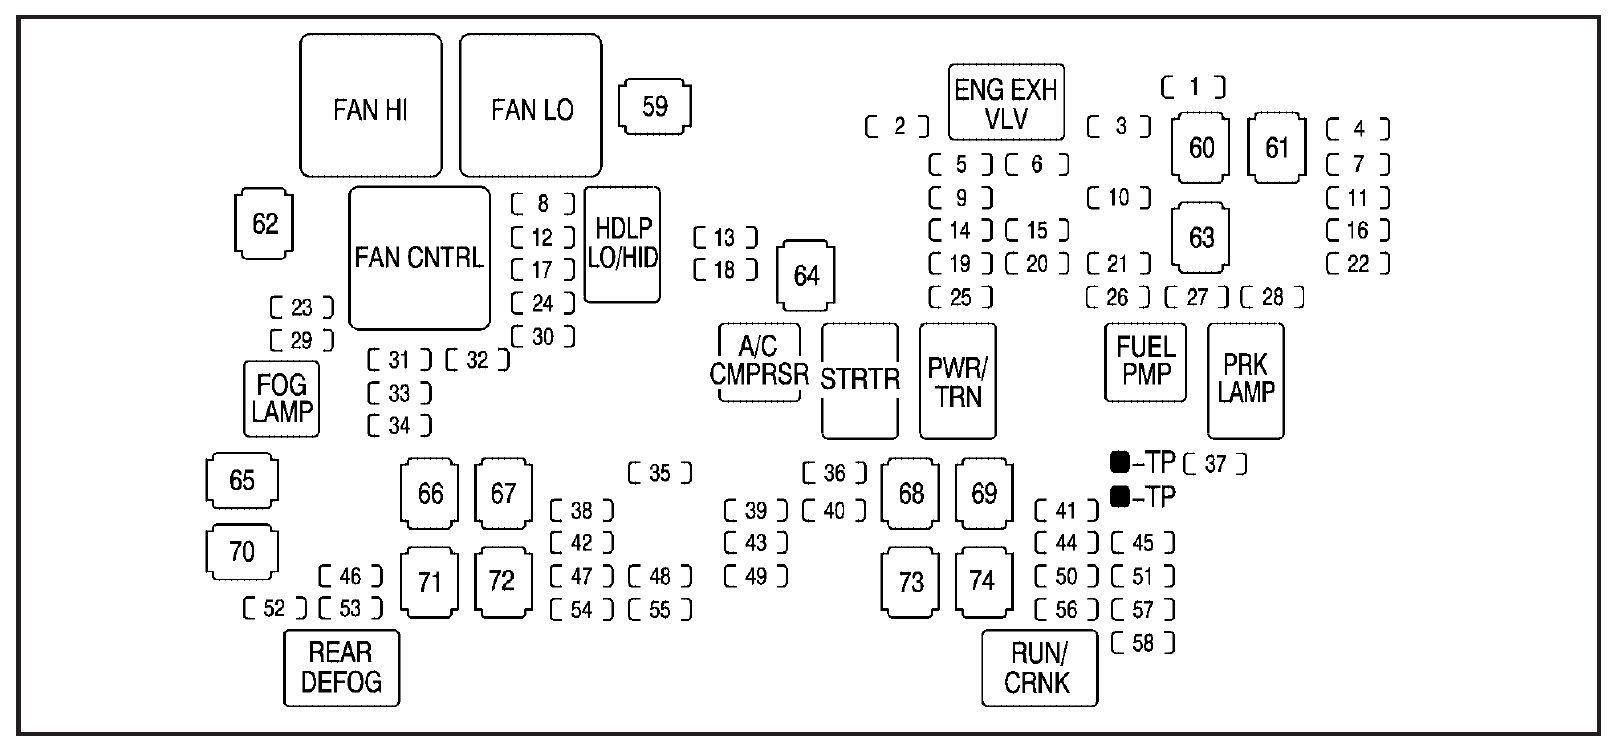 32 2002 Gmc Sierra 1500 Fuse Box Diagram